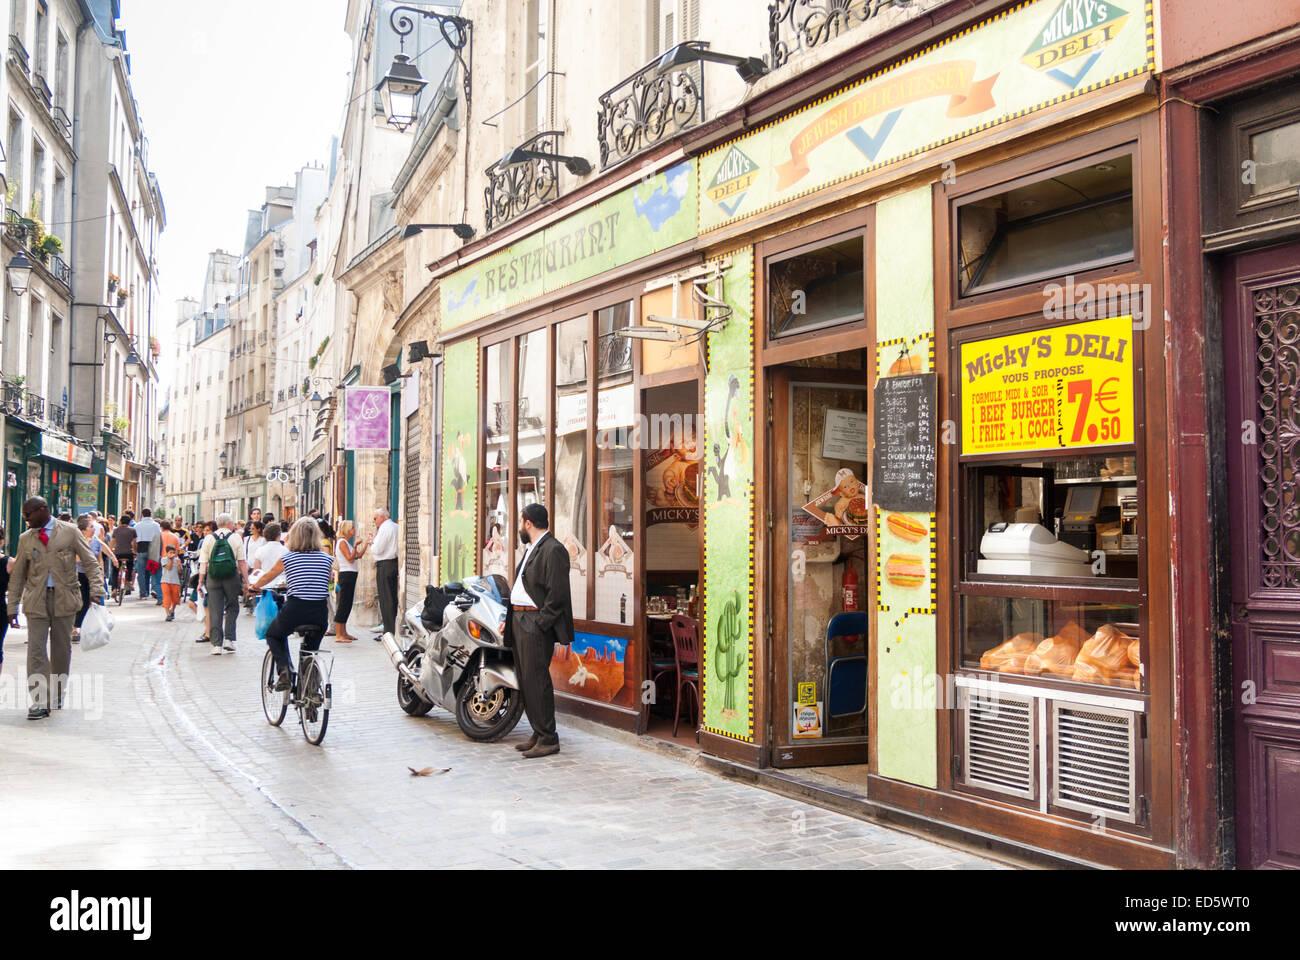 Mickey 39 s deli in rue des rosiers in the jewish quarter of the marais stoc - Location marais paris ...